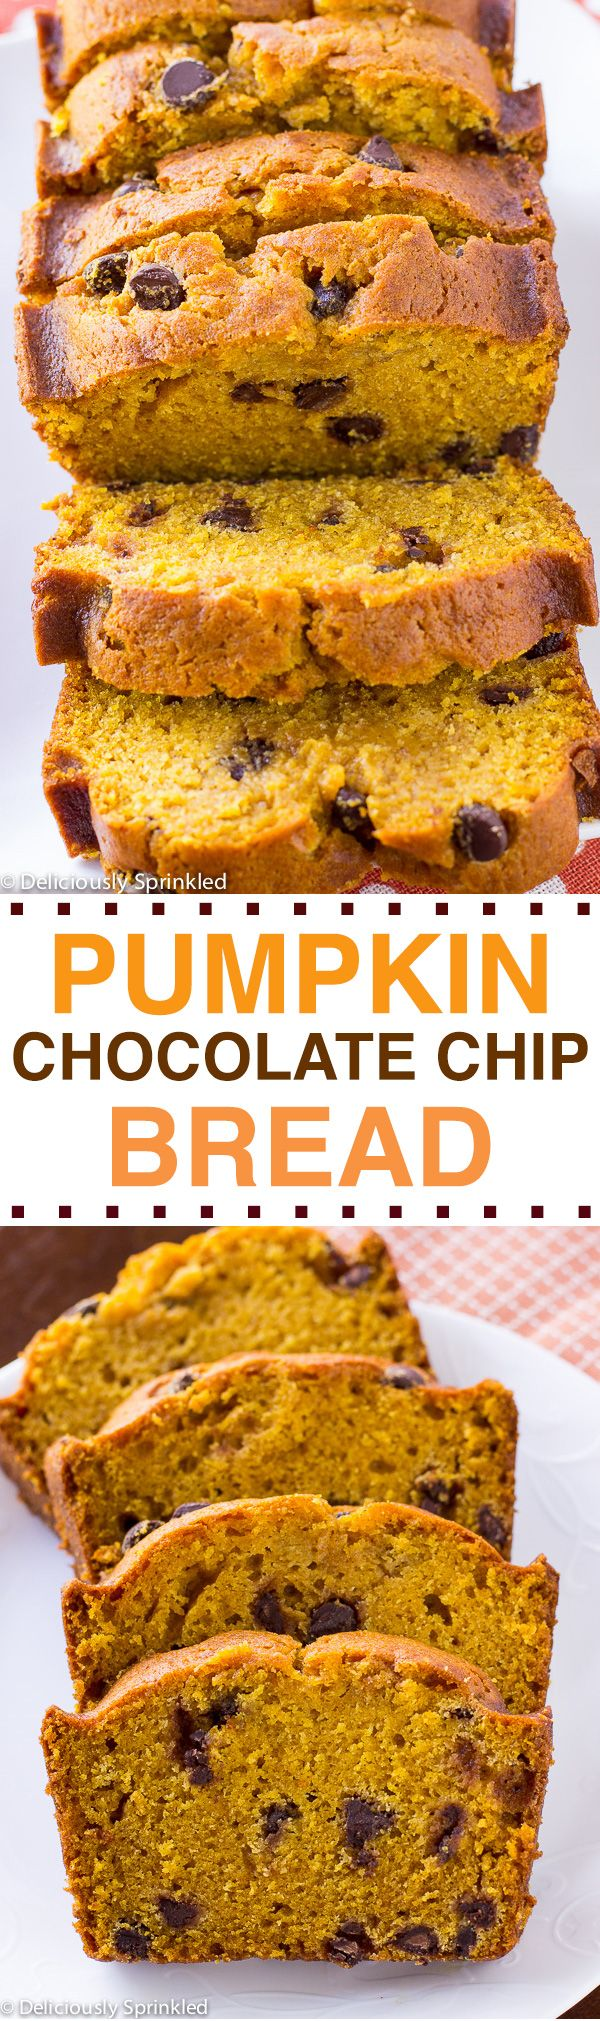 The BEST Pumpkin Chocolate Chip Bread!: